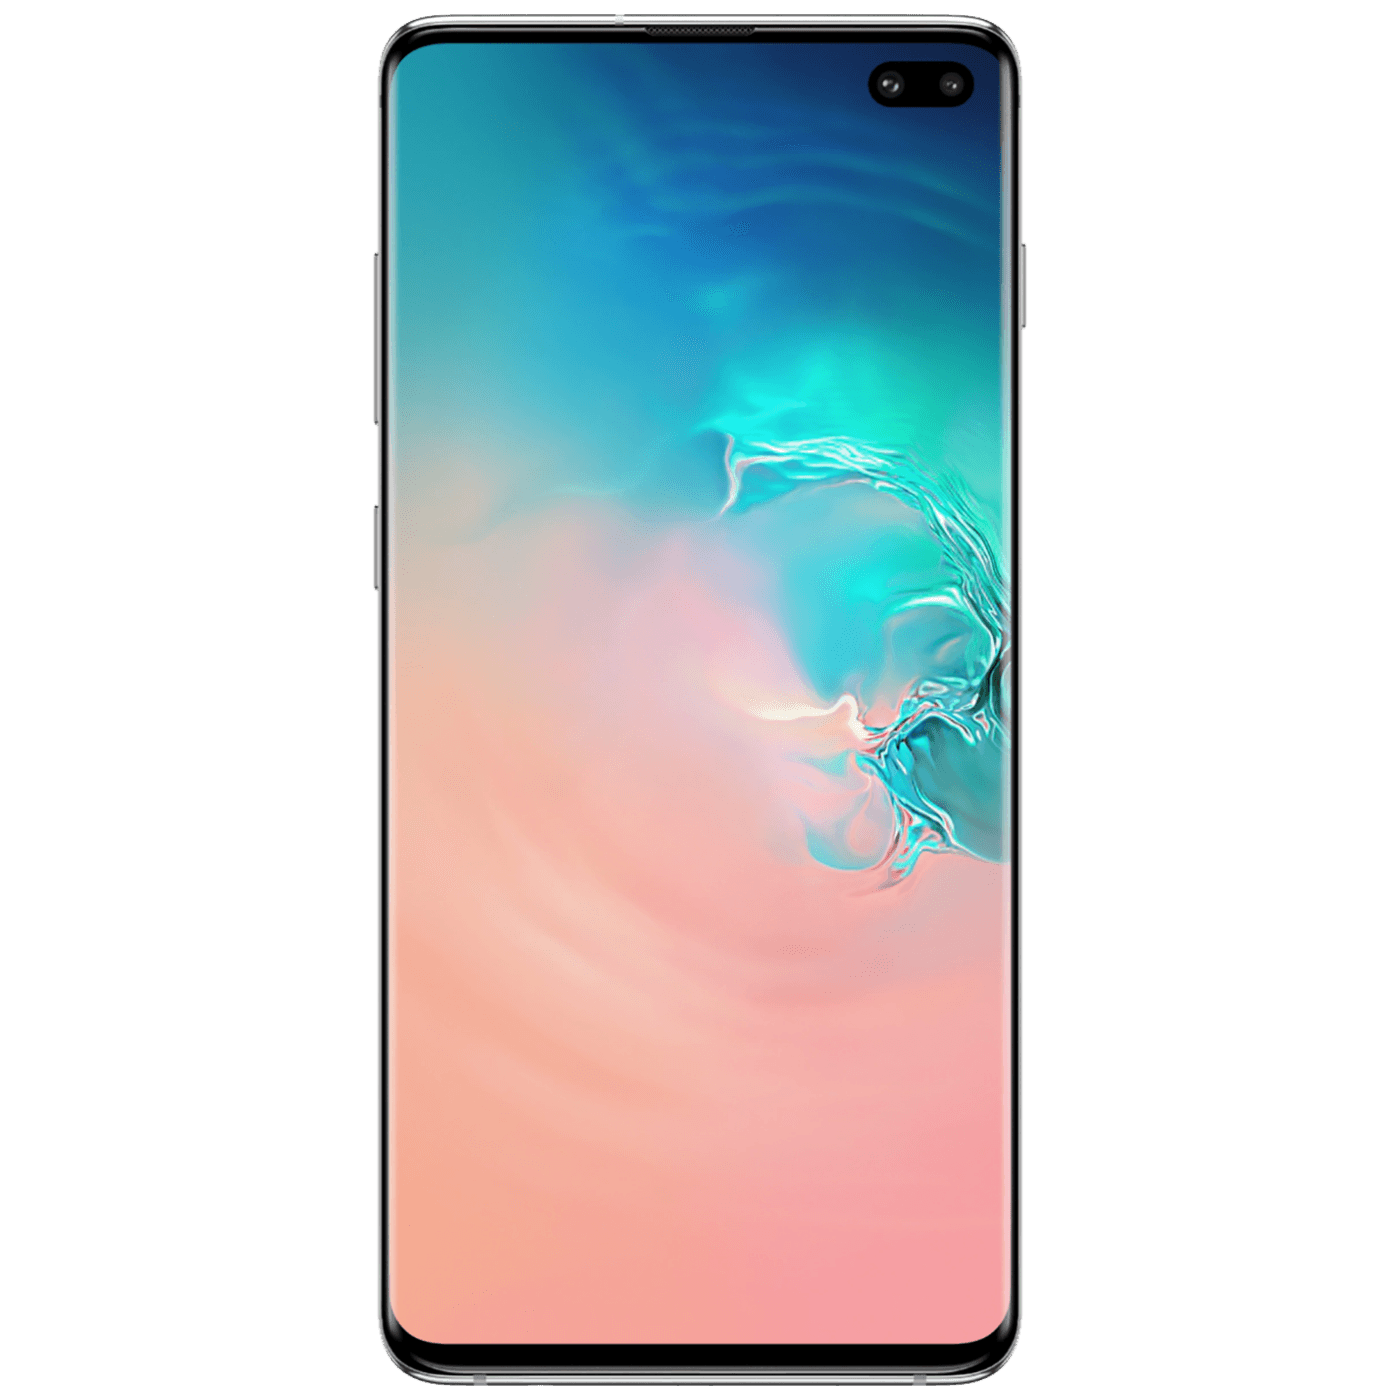 Galaxy S10 Prism White